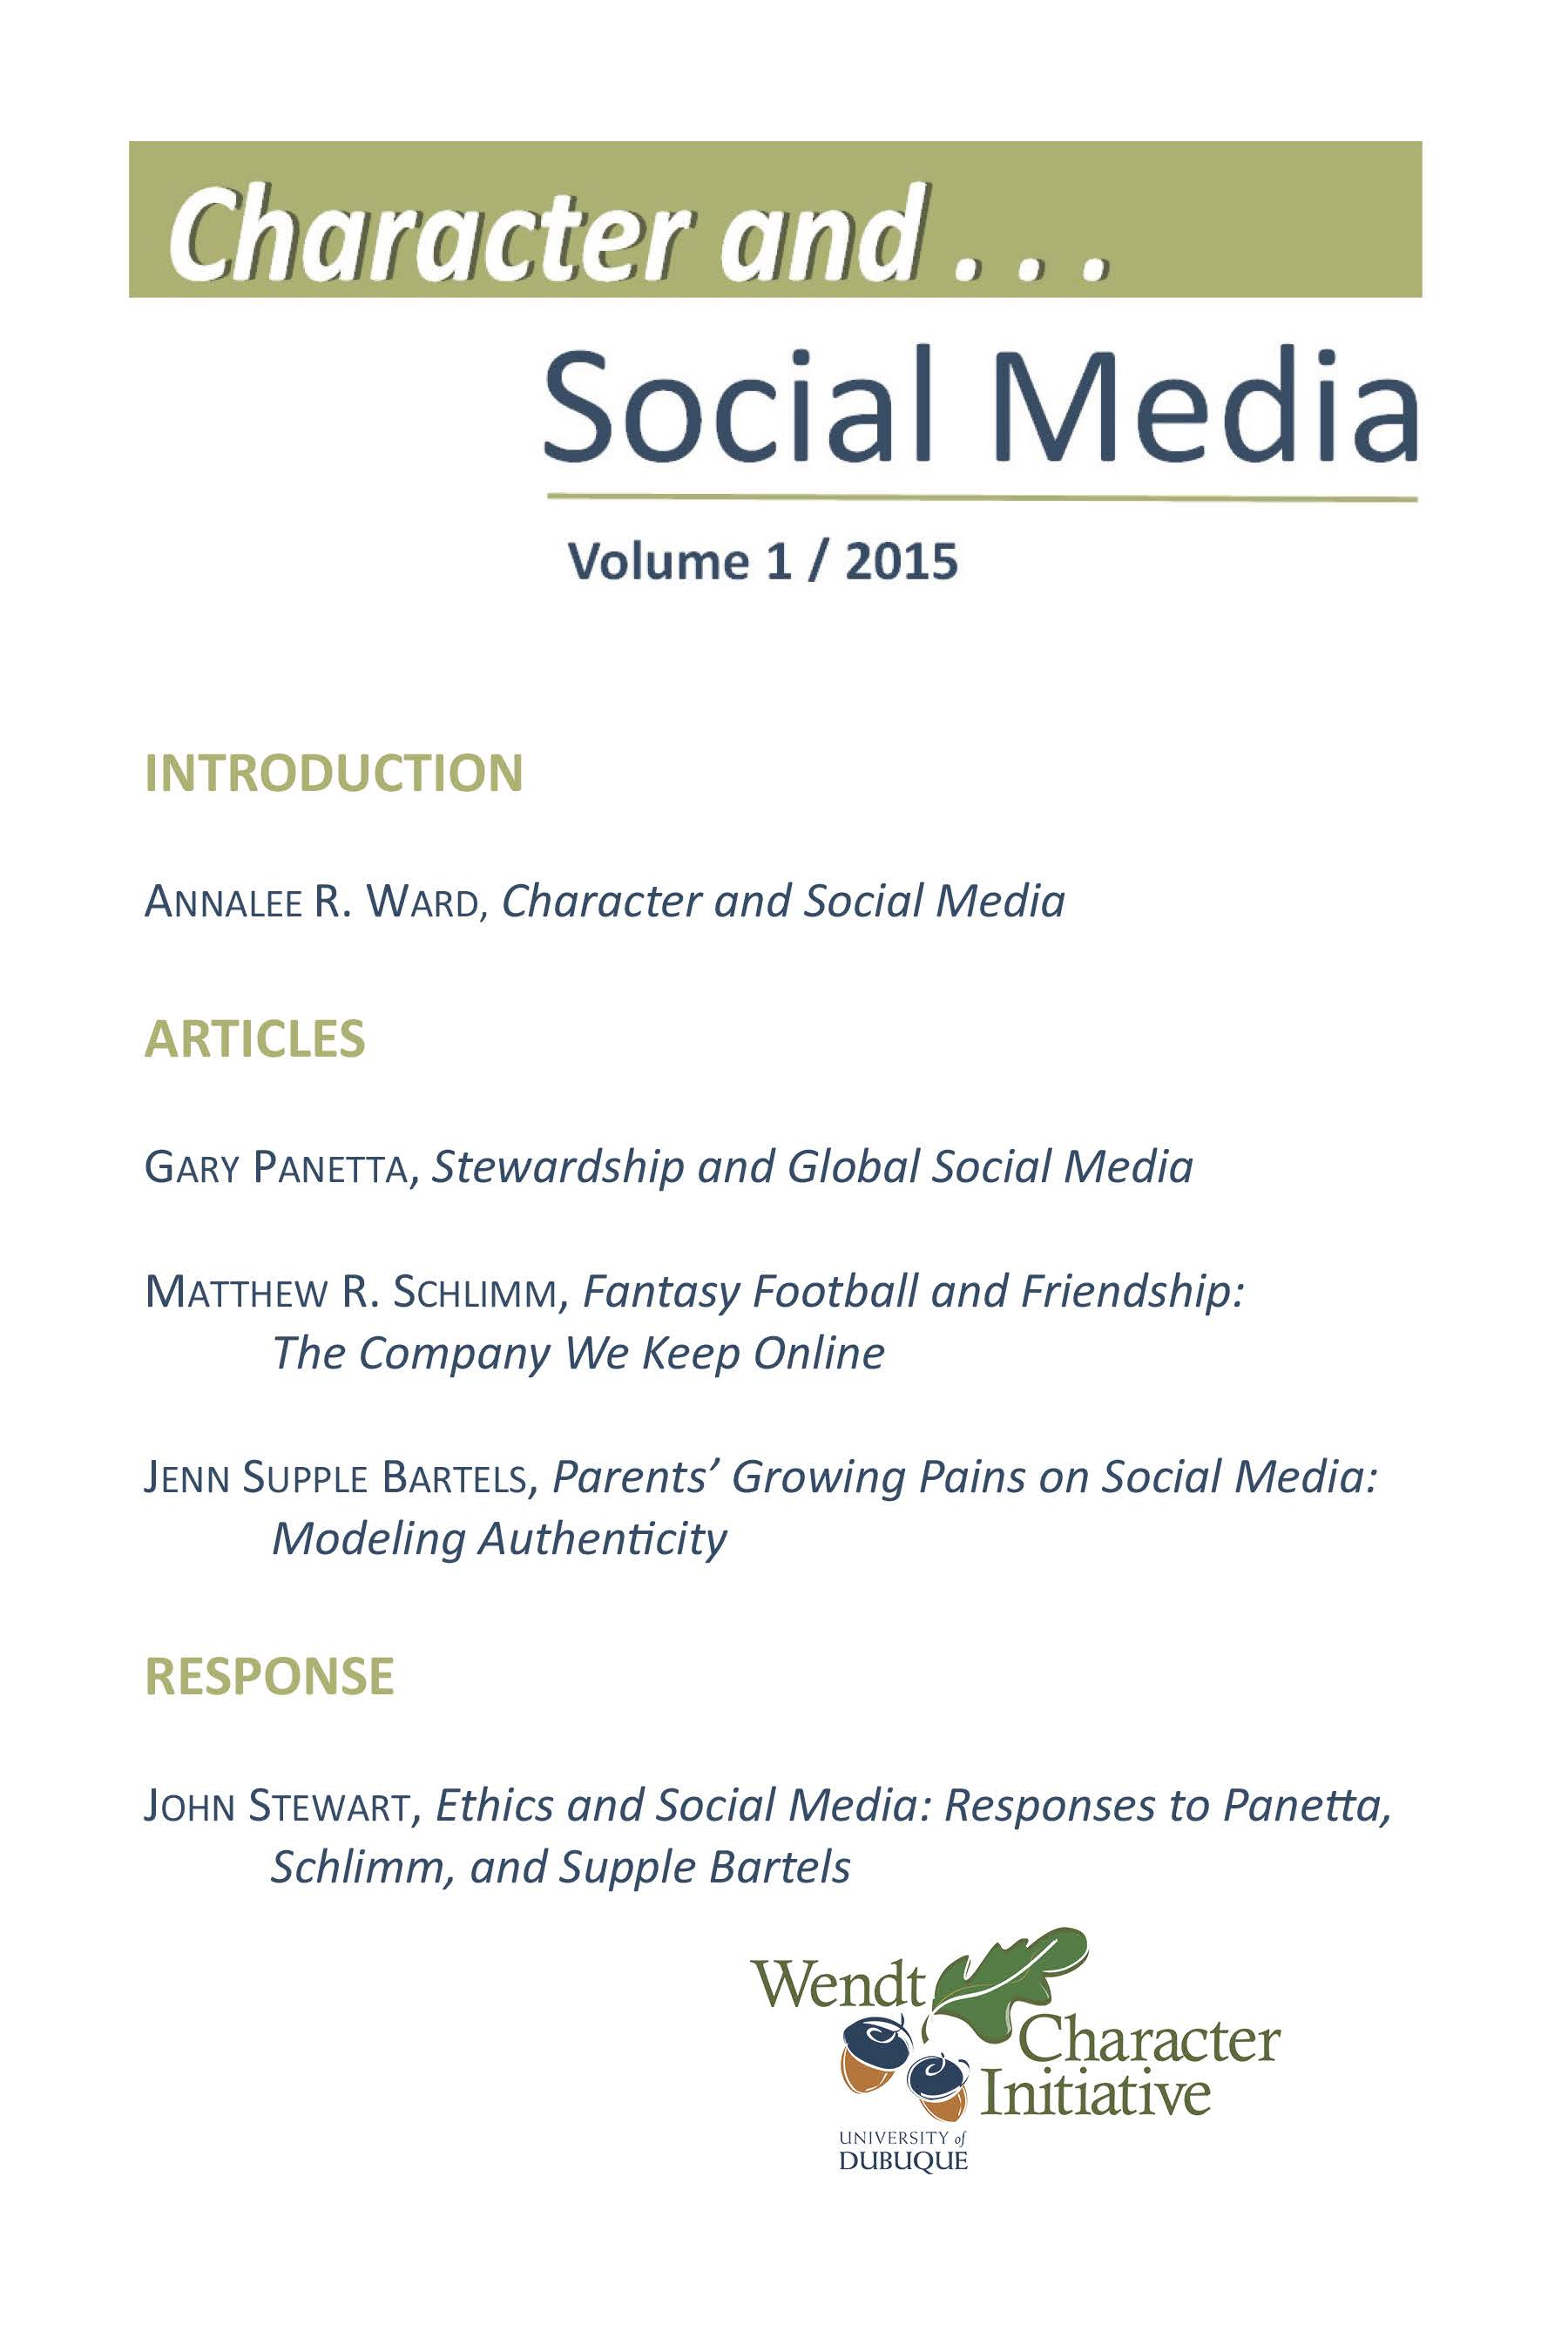 View Character and... Social Media (Vol. 1, 2015)